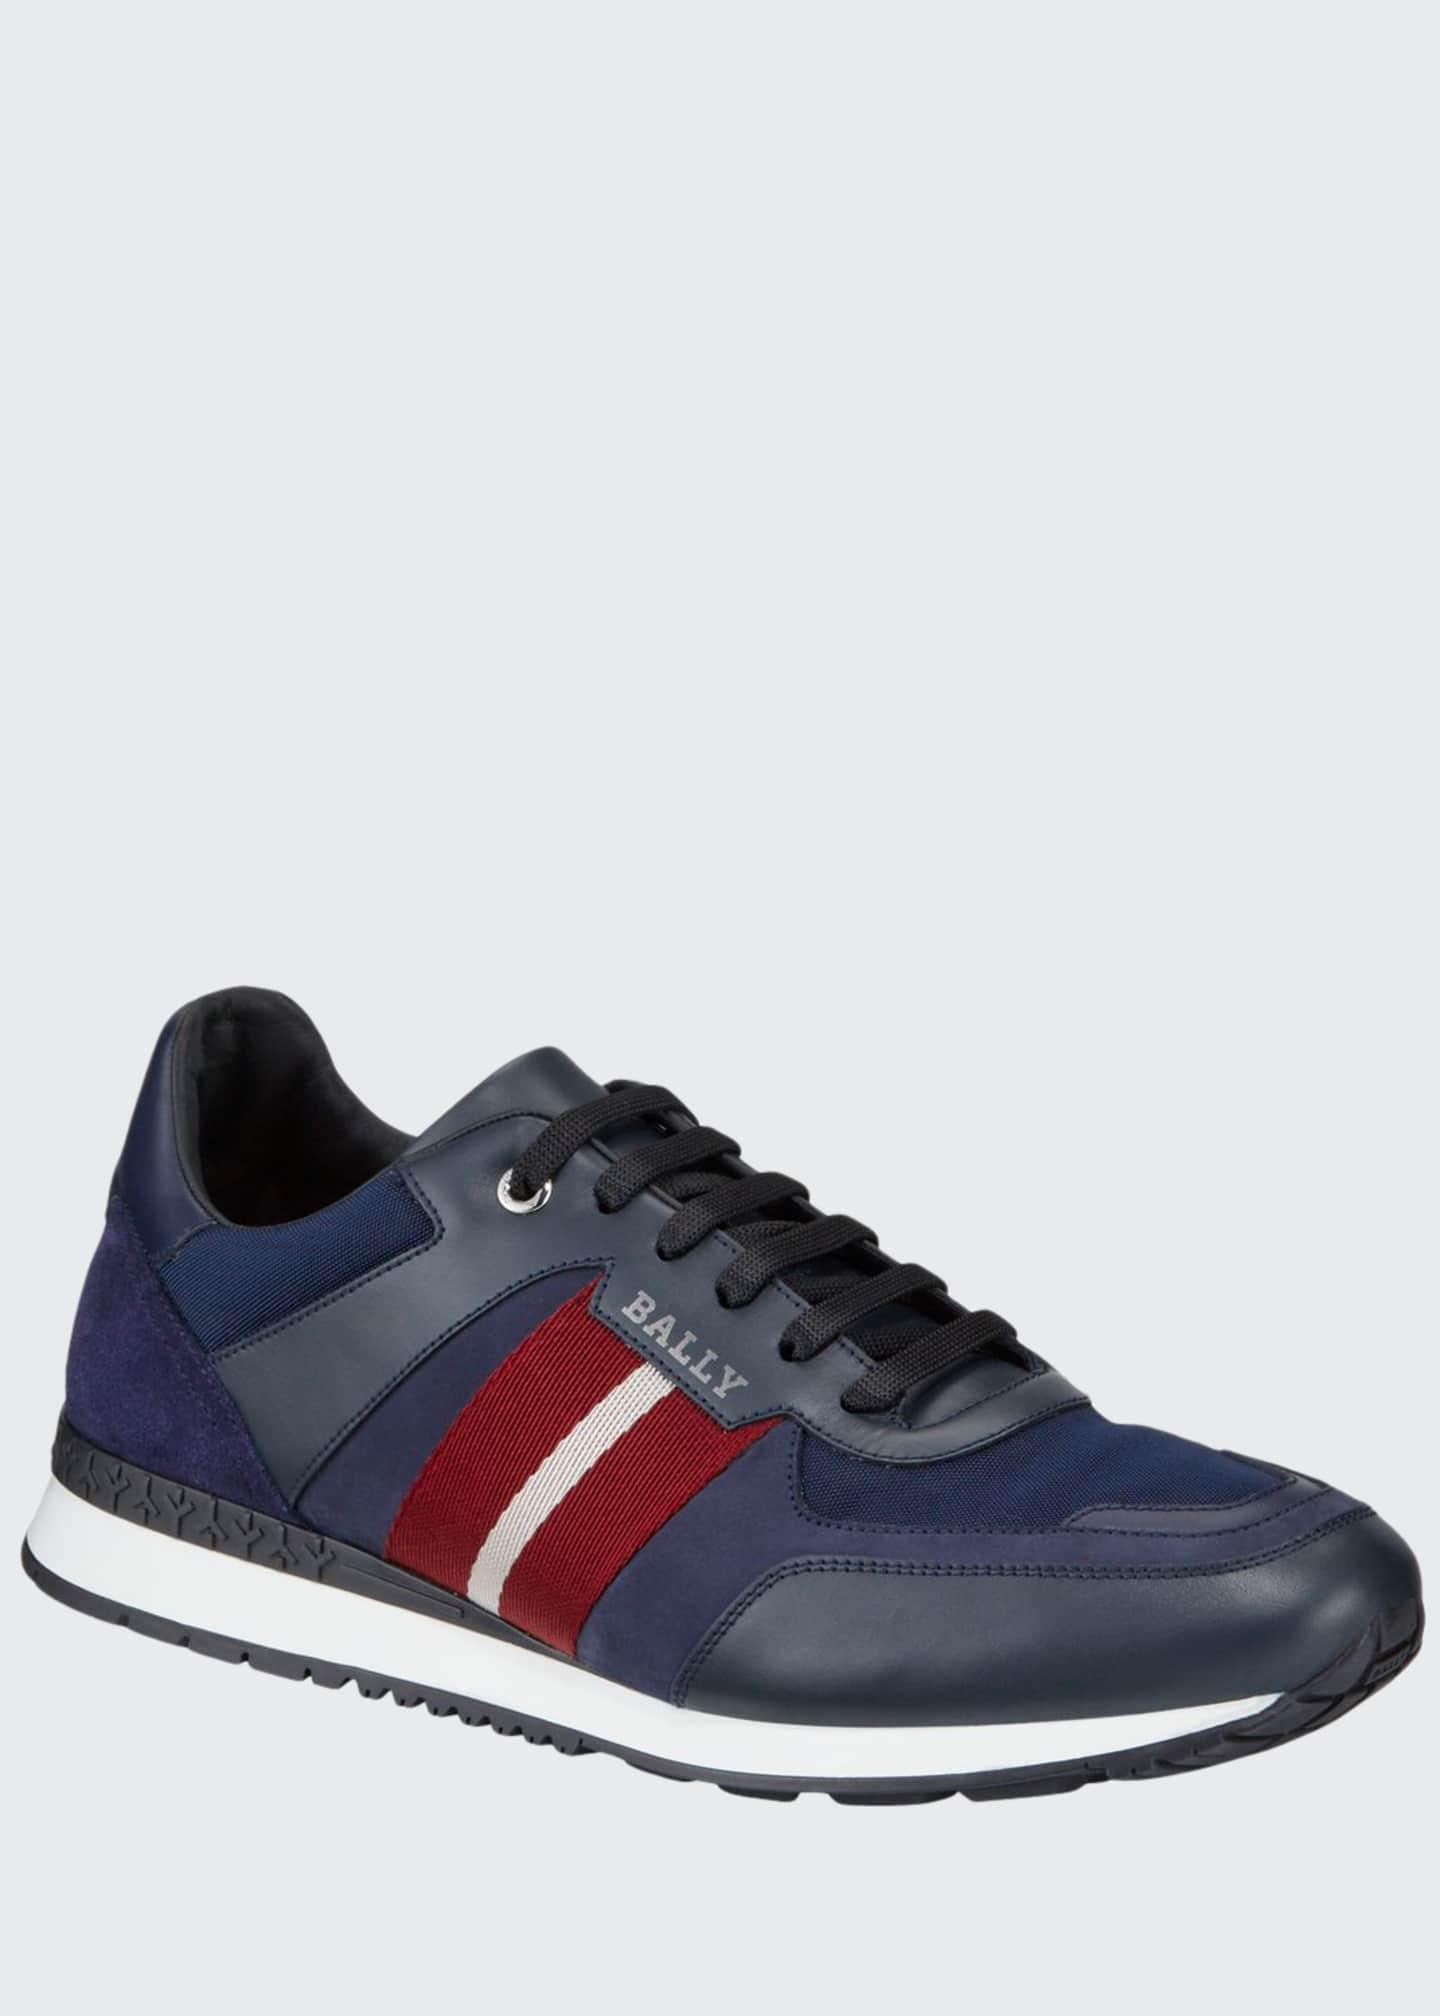 Bally Men's Aseo Multicolor Trainspotting-Stripe Sneakers